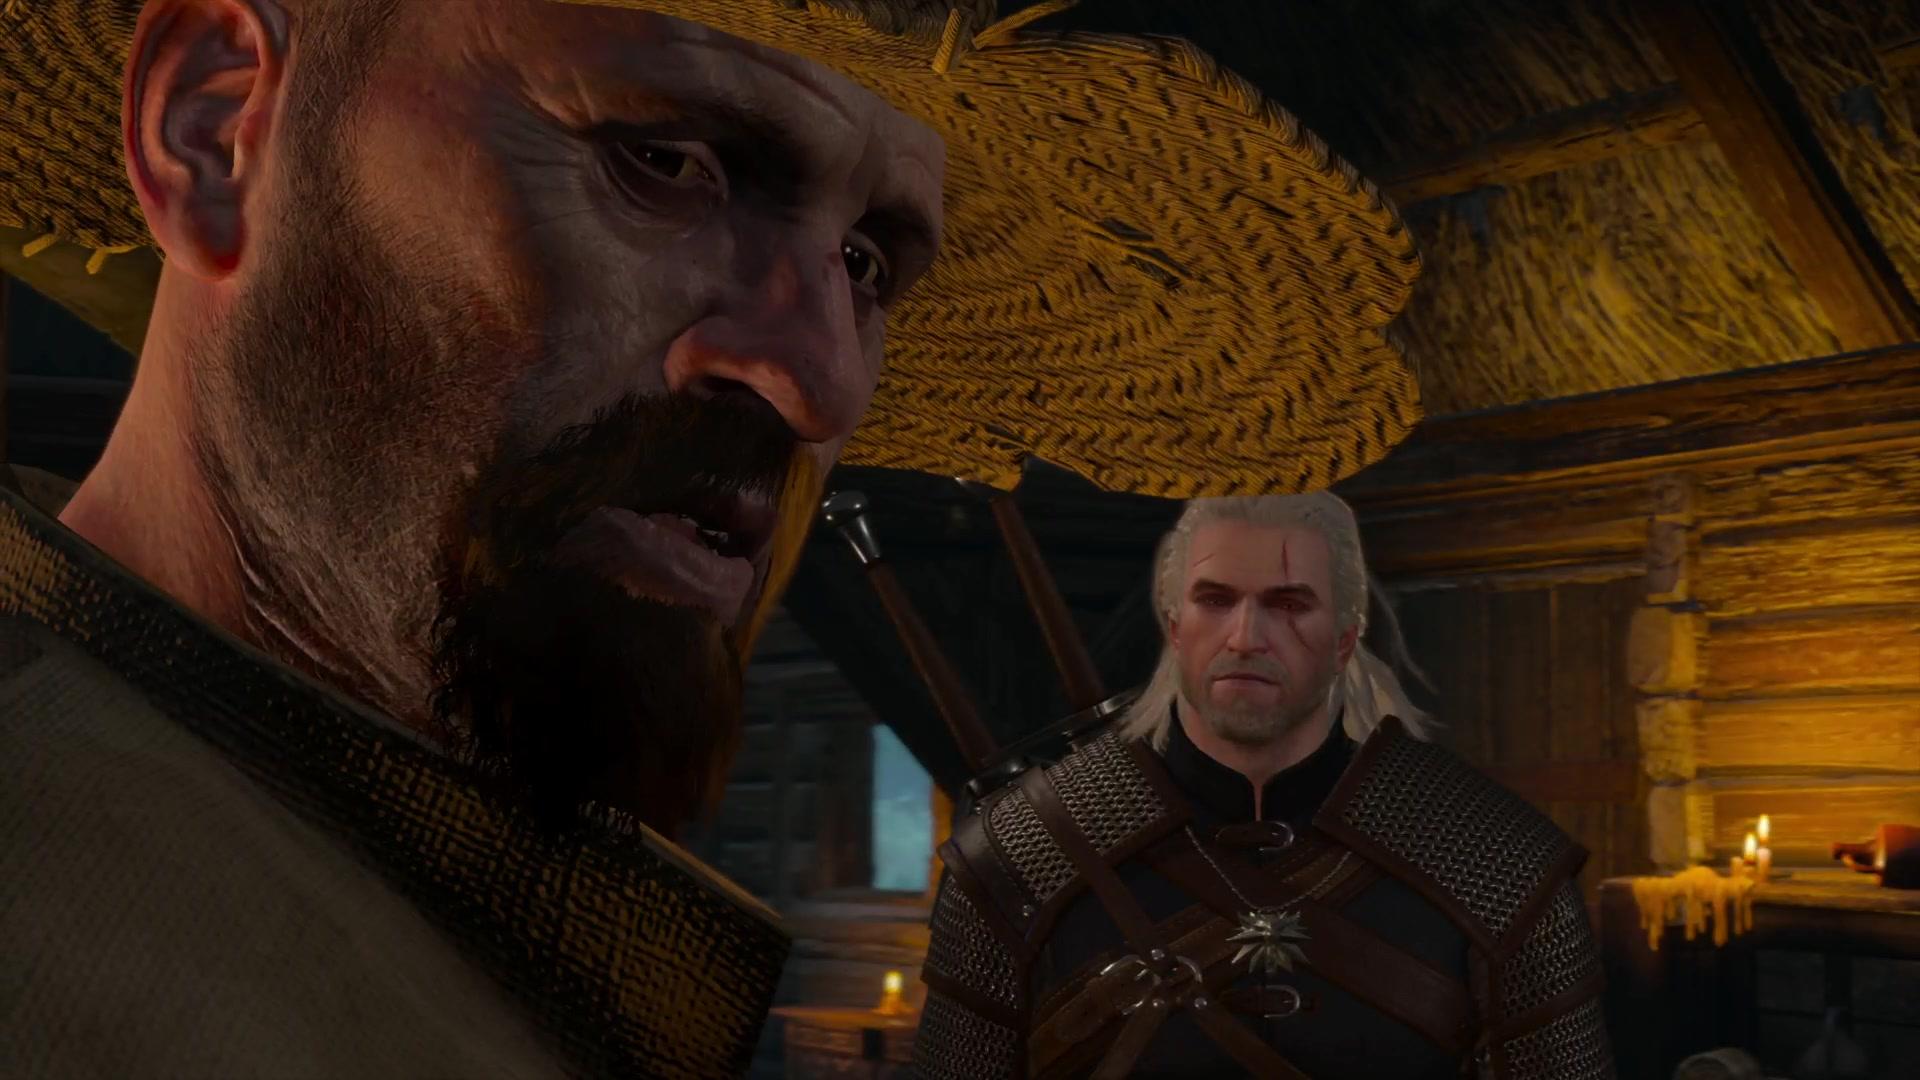 Ведьмак 3_ Дикая Охота_20180310140531 824.jpg - Witcher 3: Wild Hunt, the